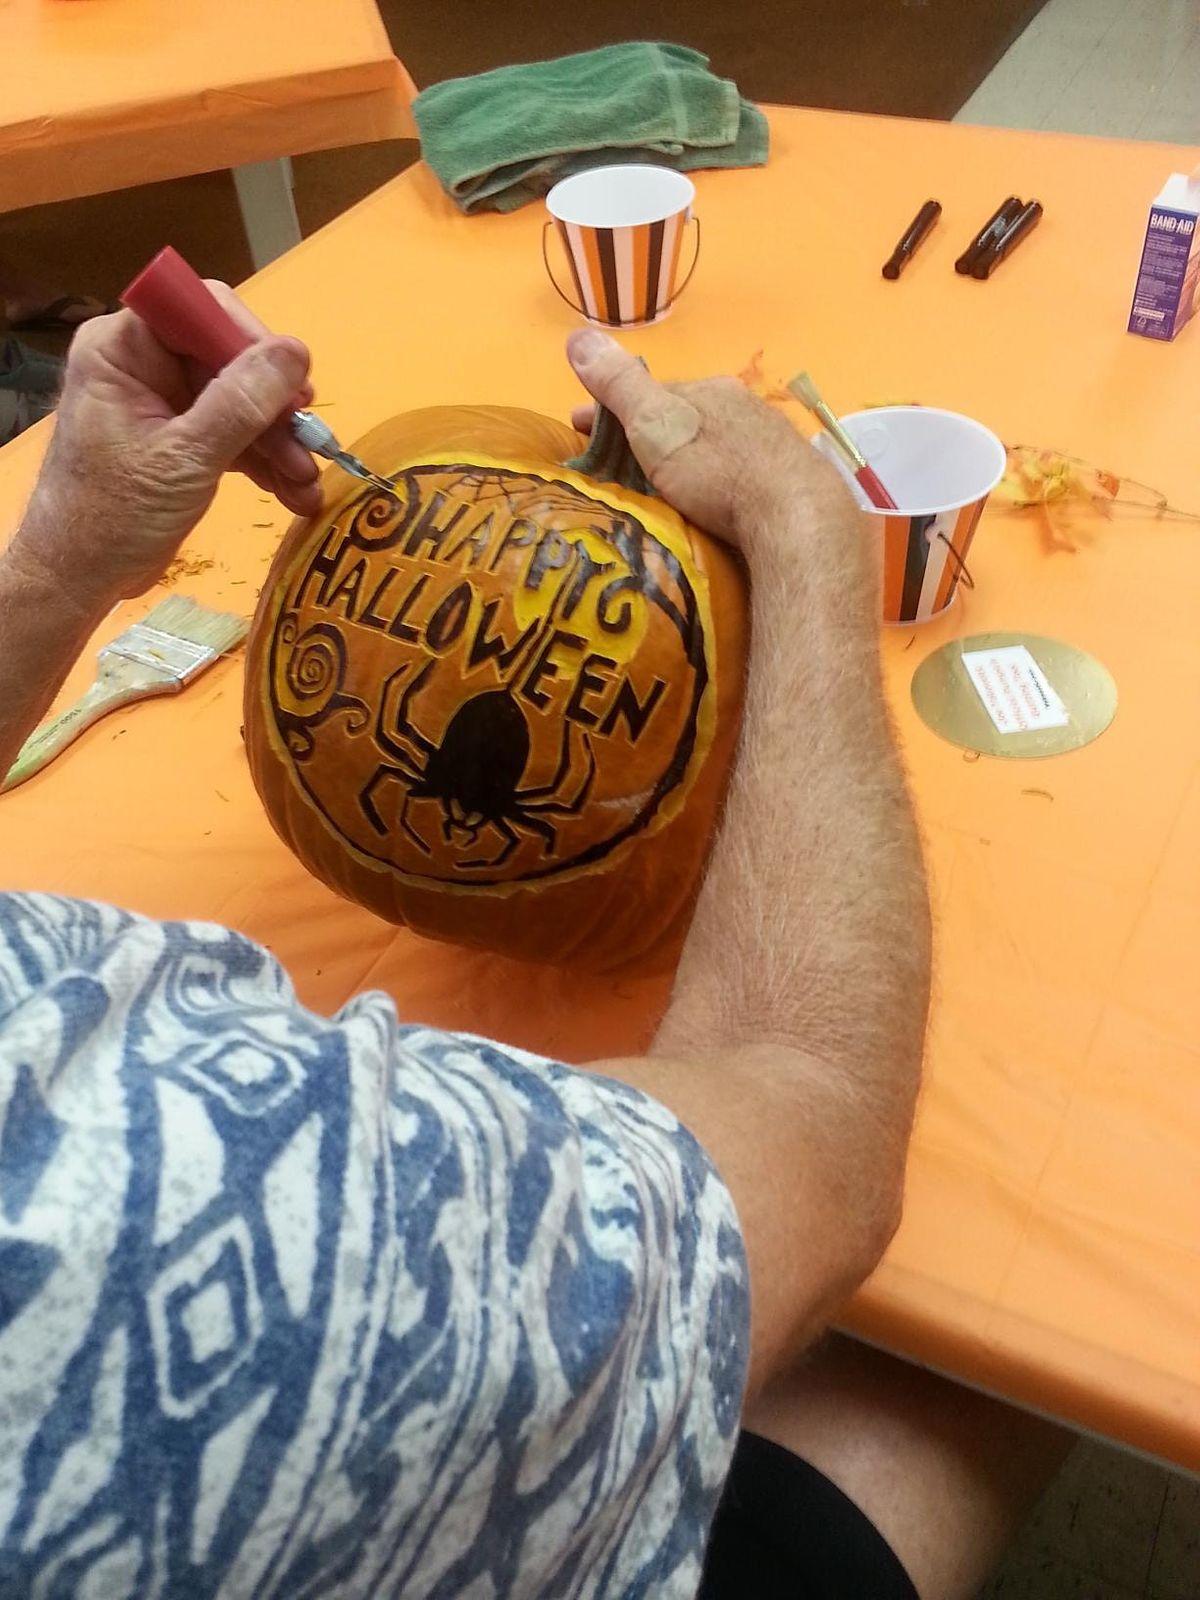 Pumpkin Carving Workshop, 30 October | Event in Orlando | AllEvents.in